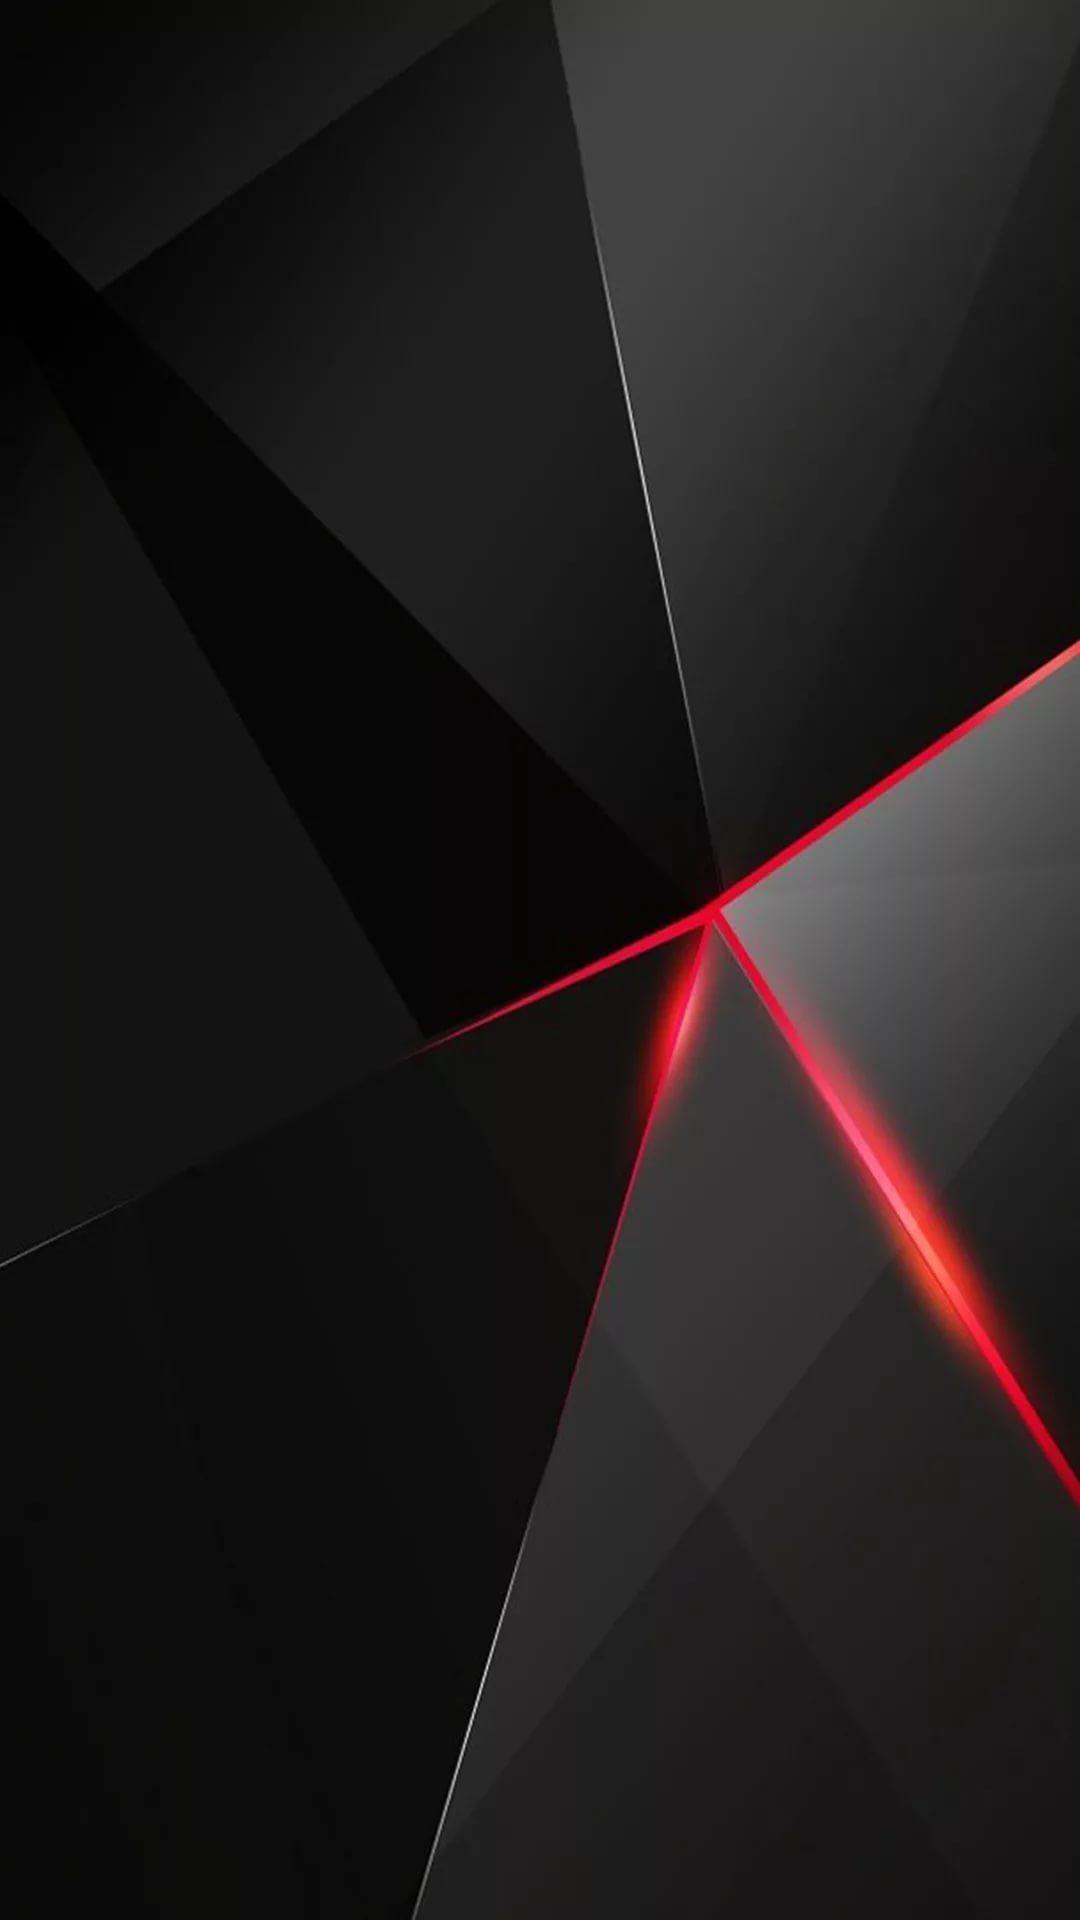 Black Red iPhone 7 wallpaper